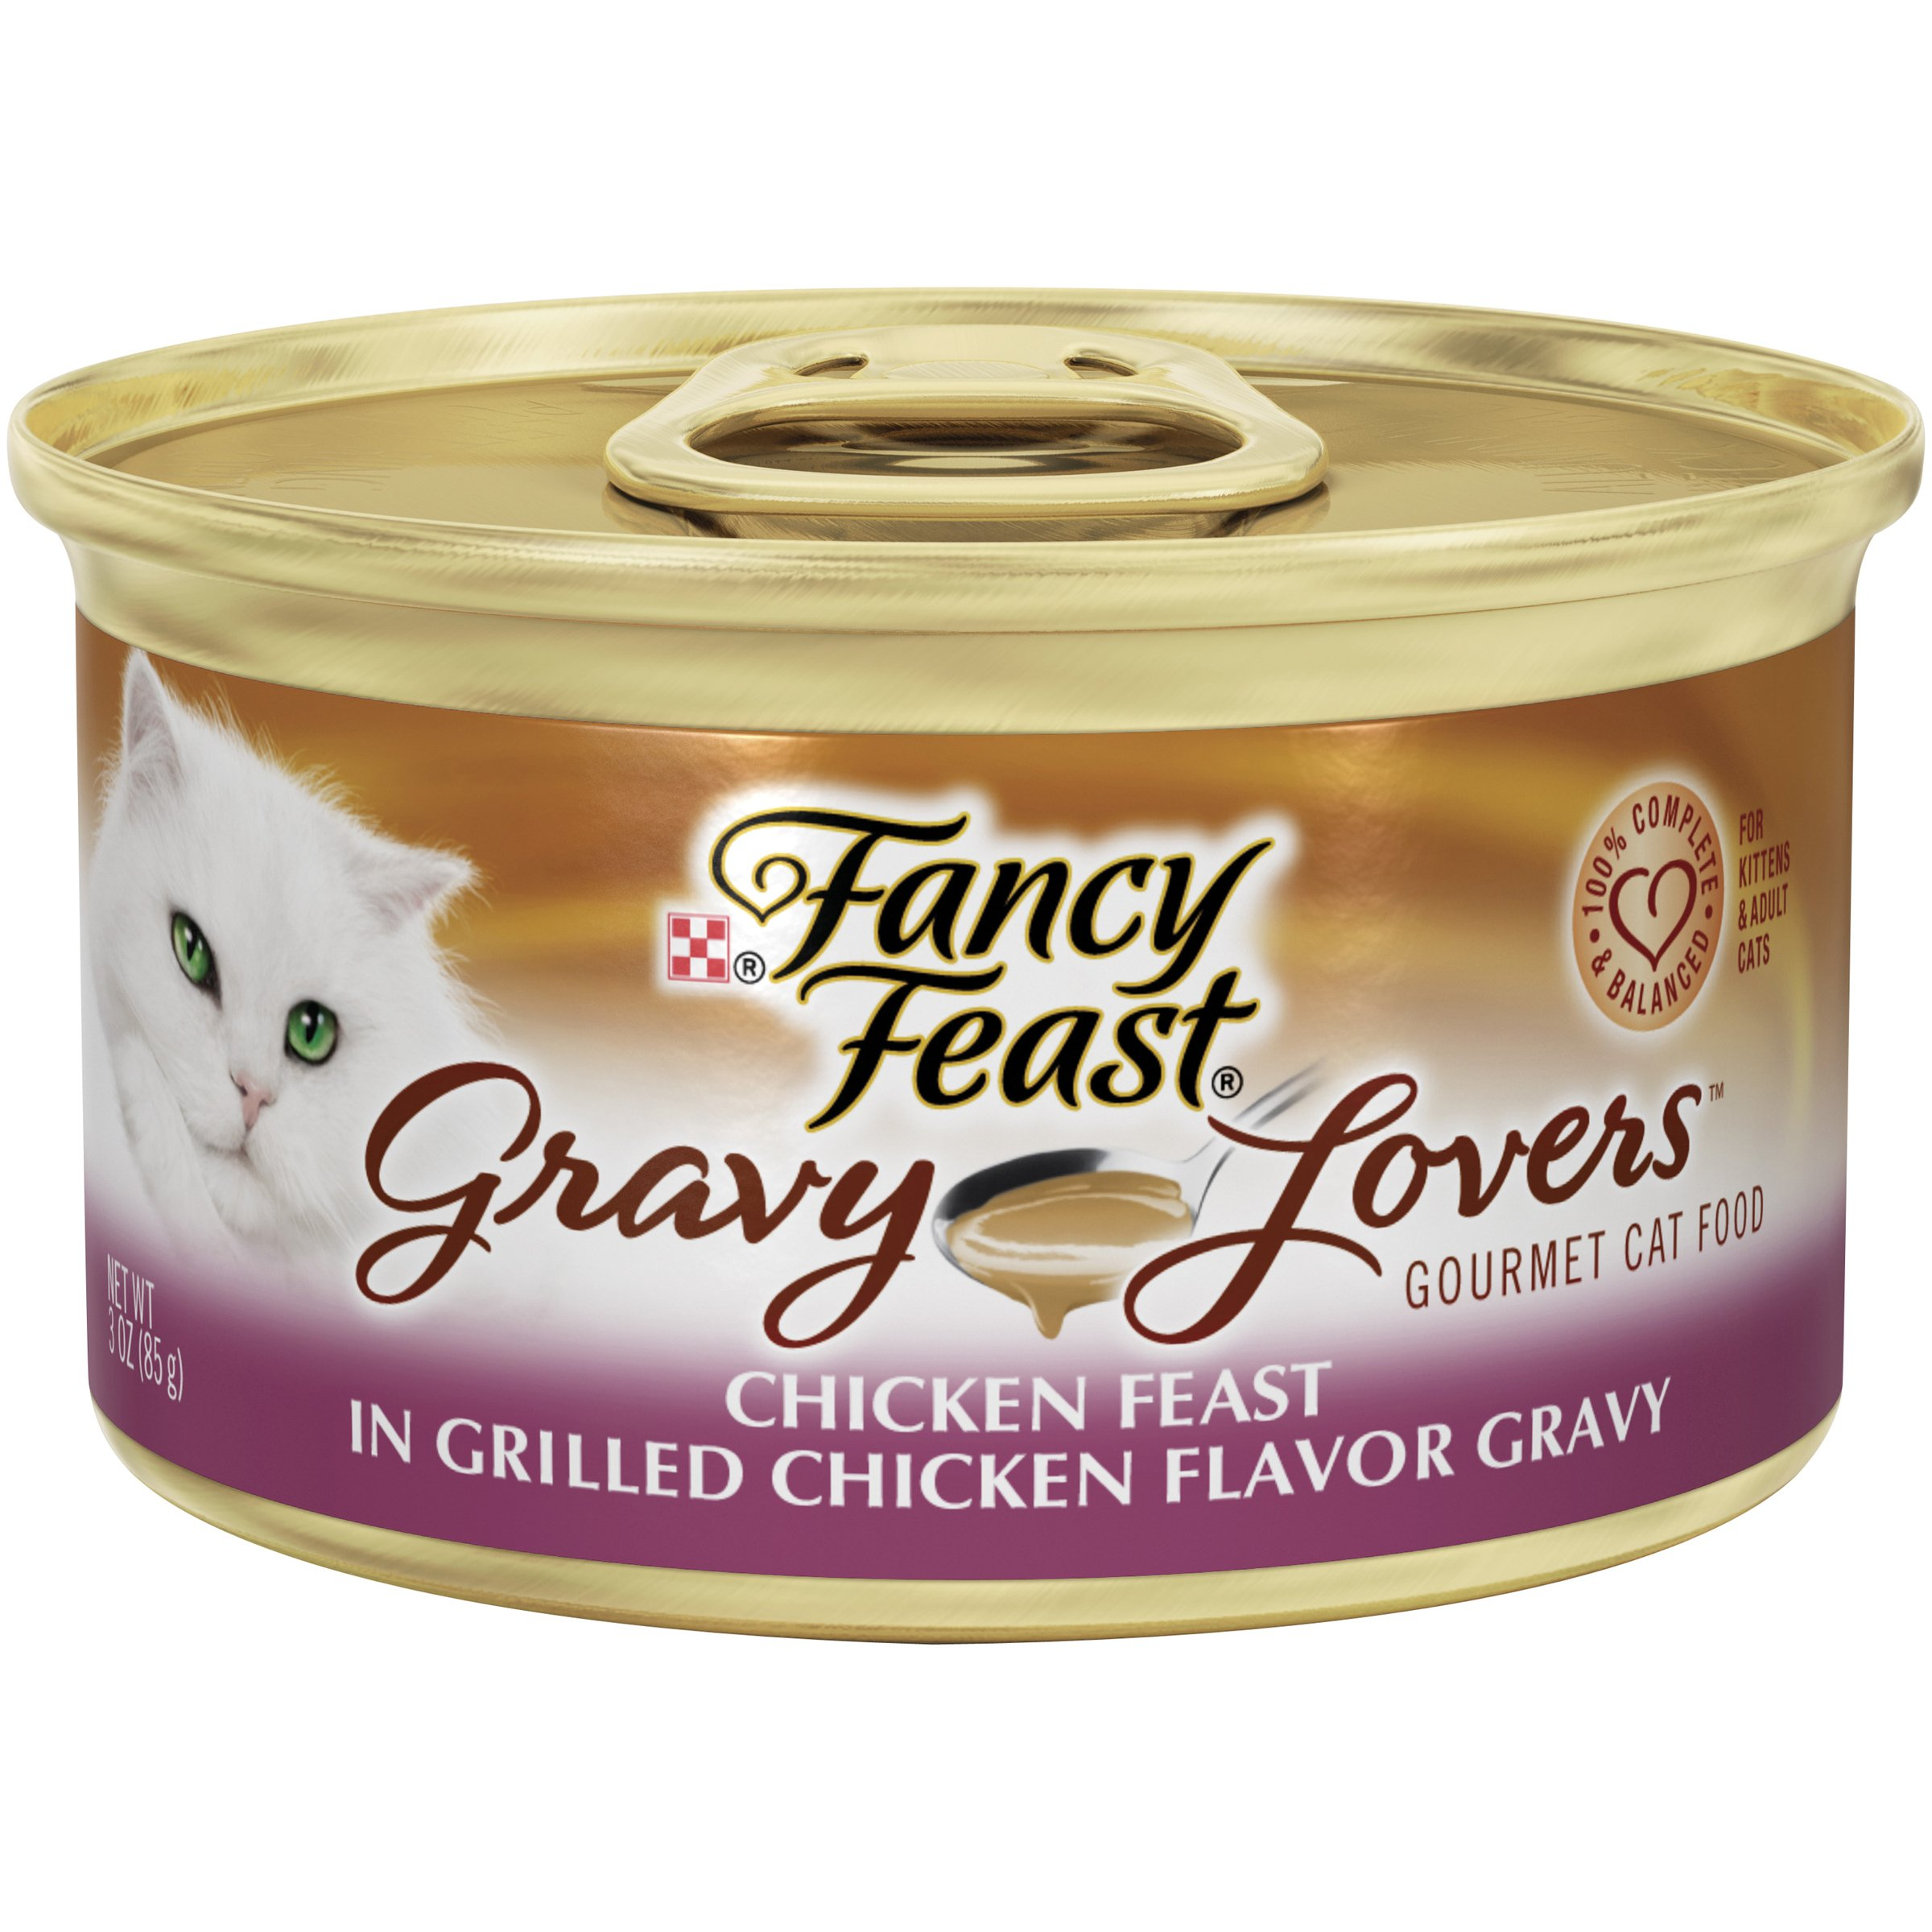 Purina Fancy Feast Gravy Lovers Wet Cat Food - (24) 3 oz. Cans